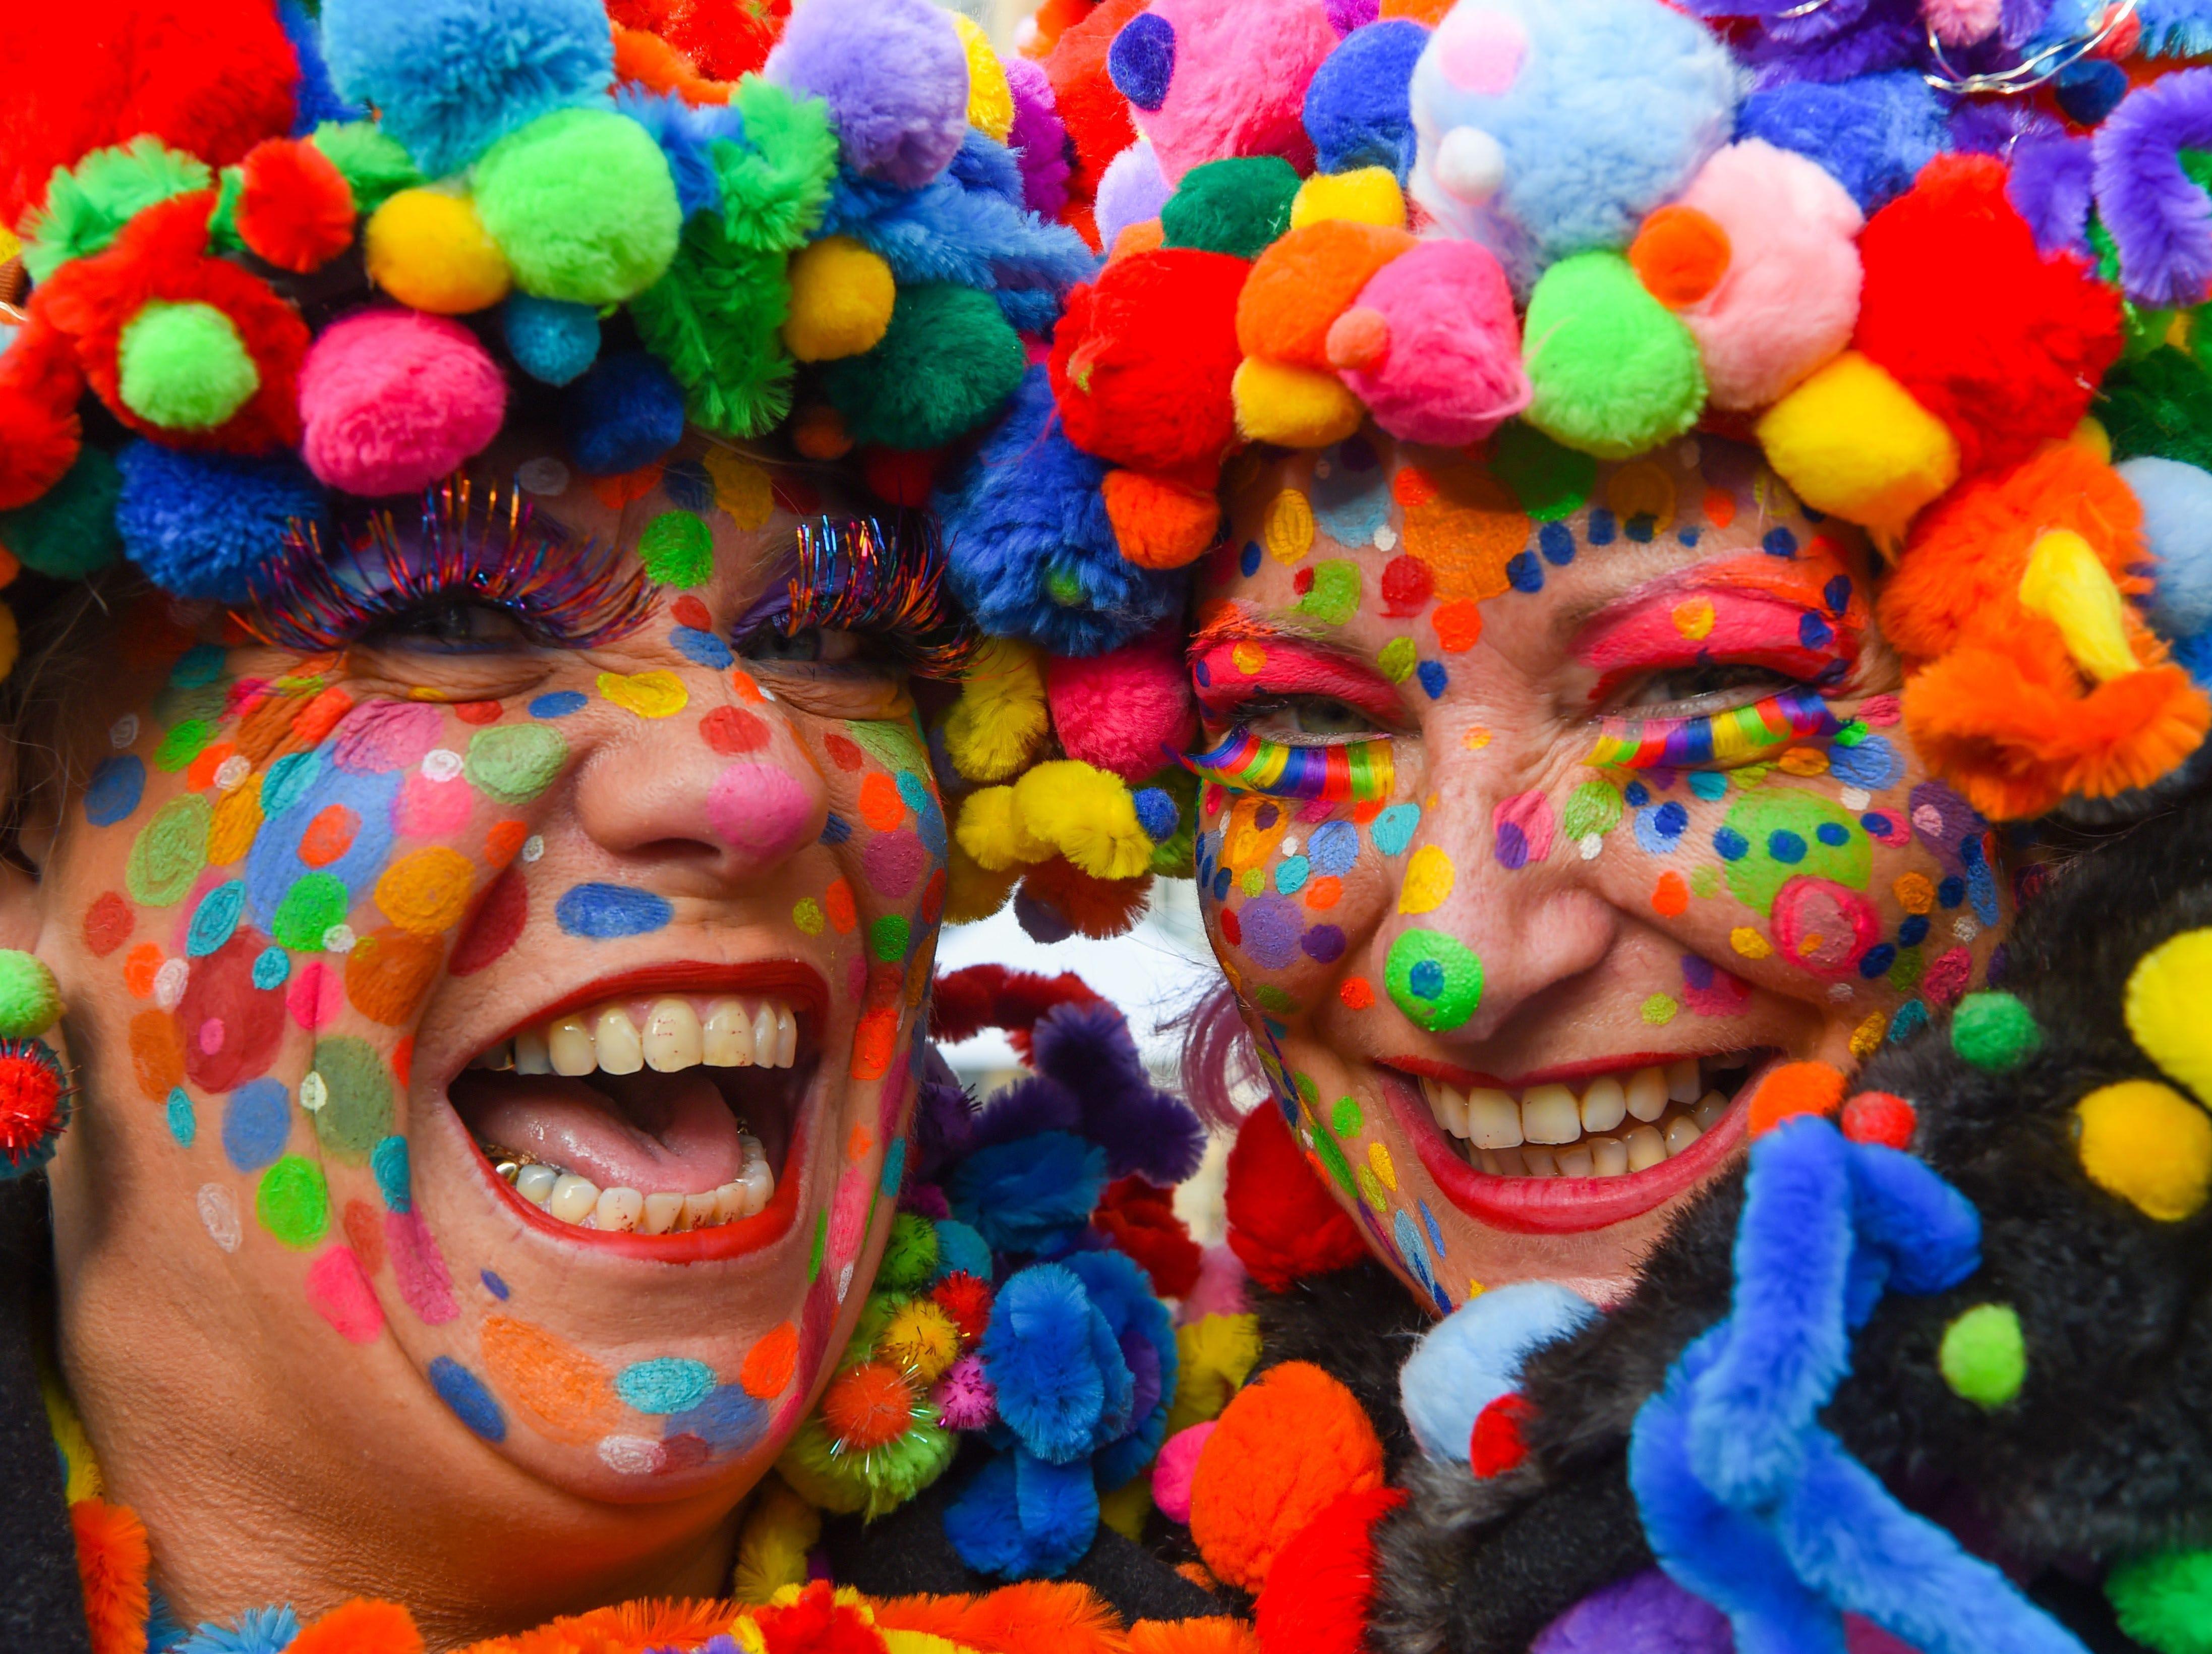 Revellers celebrate the start of the Carnival season in Duesseldorf, Germany, on Nov. 11, 2018.